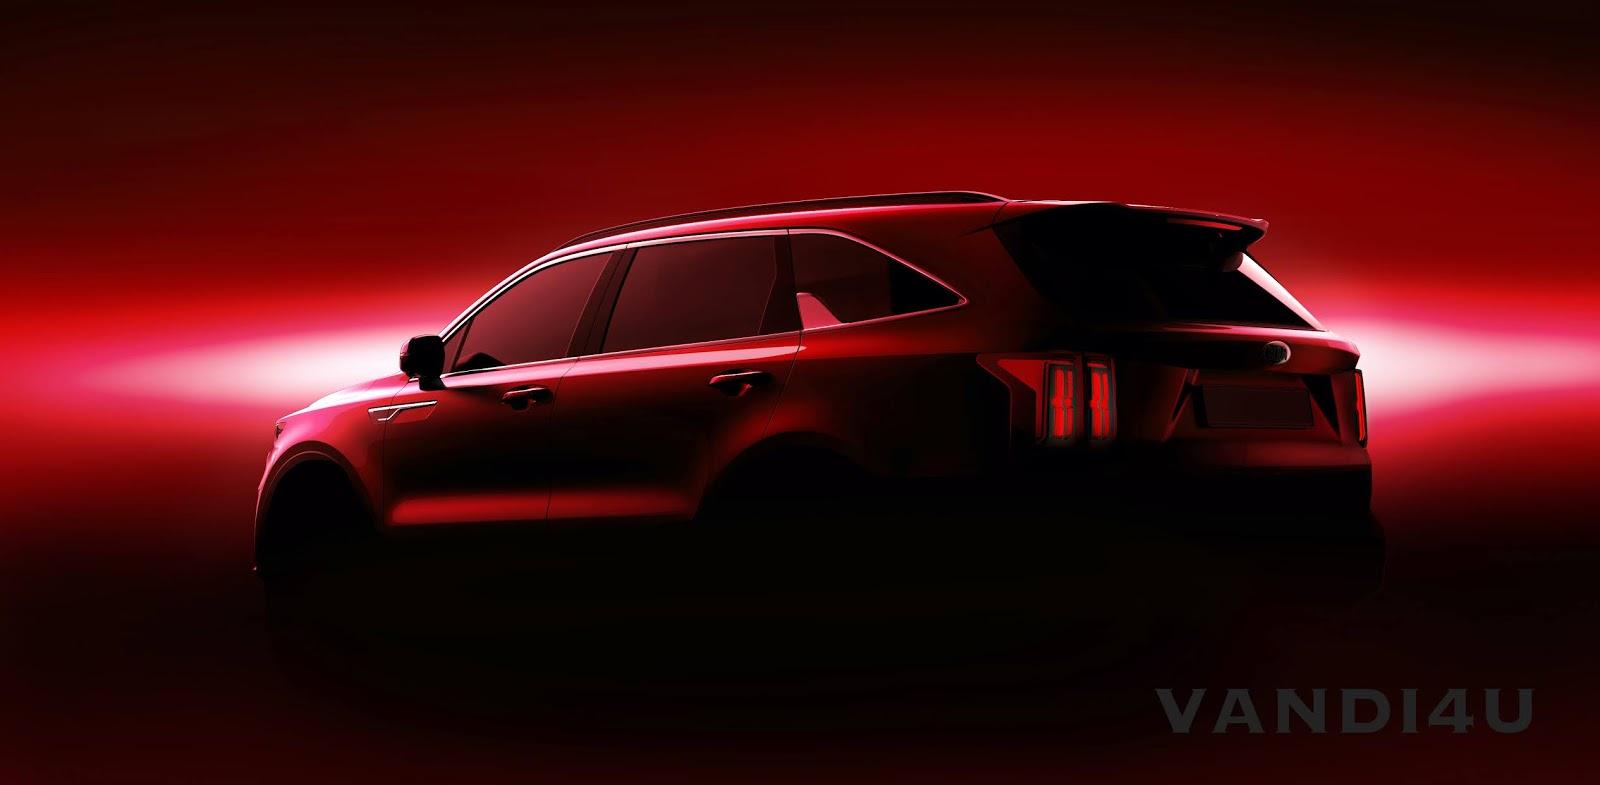 Kia Sorento will be revealed at the 2020 Geneva International Motor Show   VANDI4U